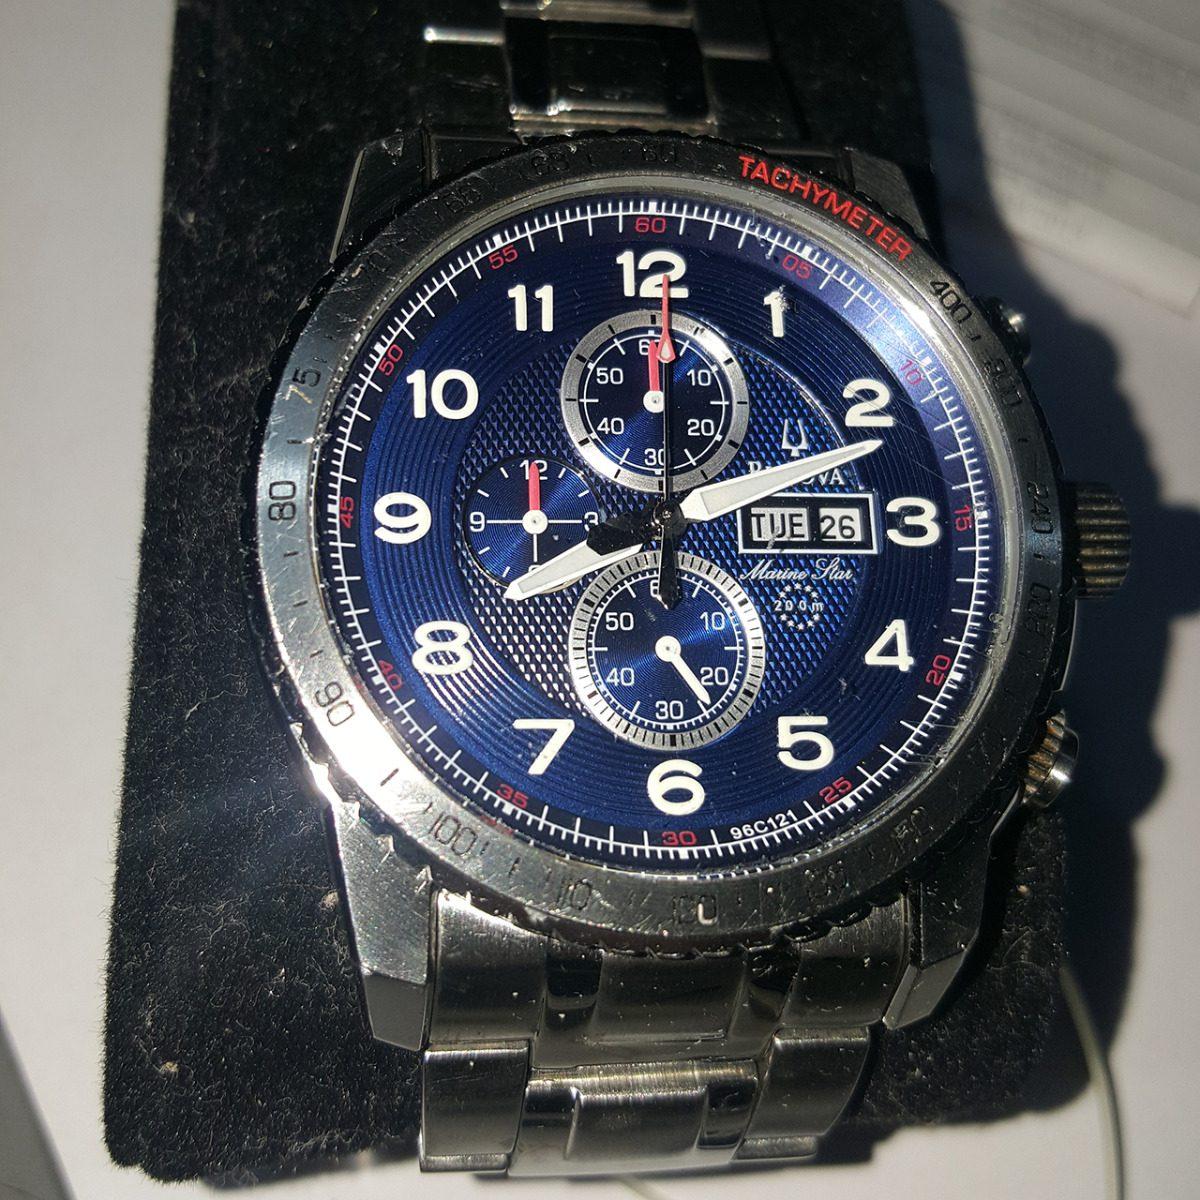 ba3308e4763 relógio bulova 96c121 marine star masculino cronografo. Carregando zoom.